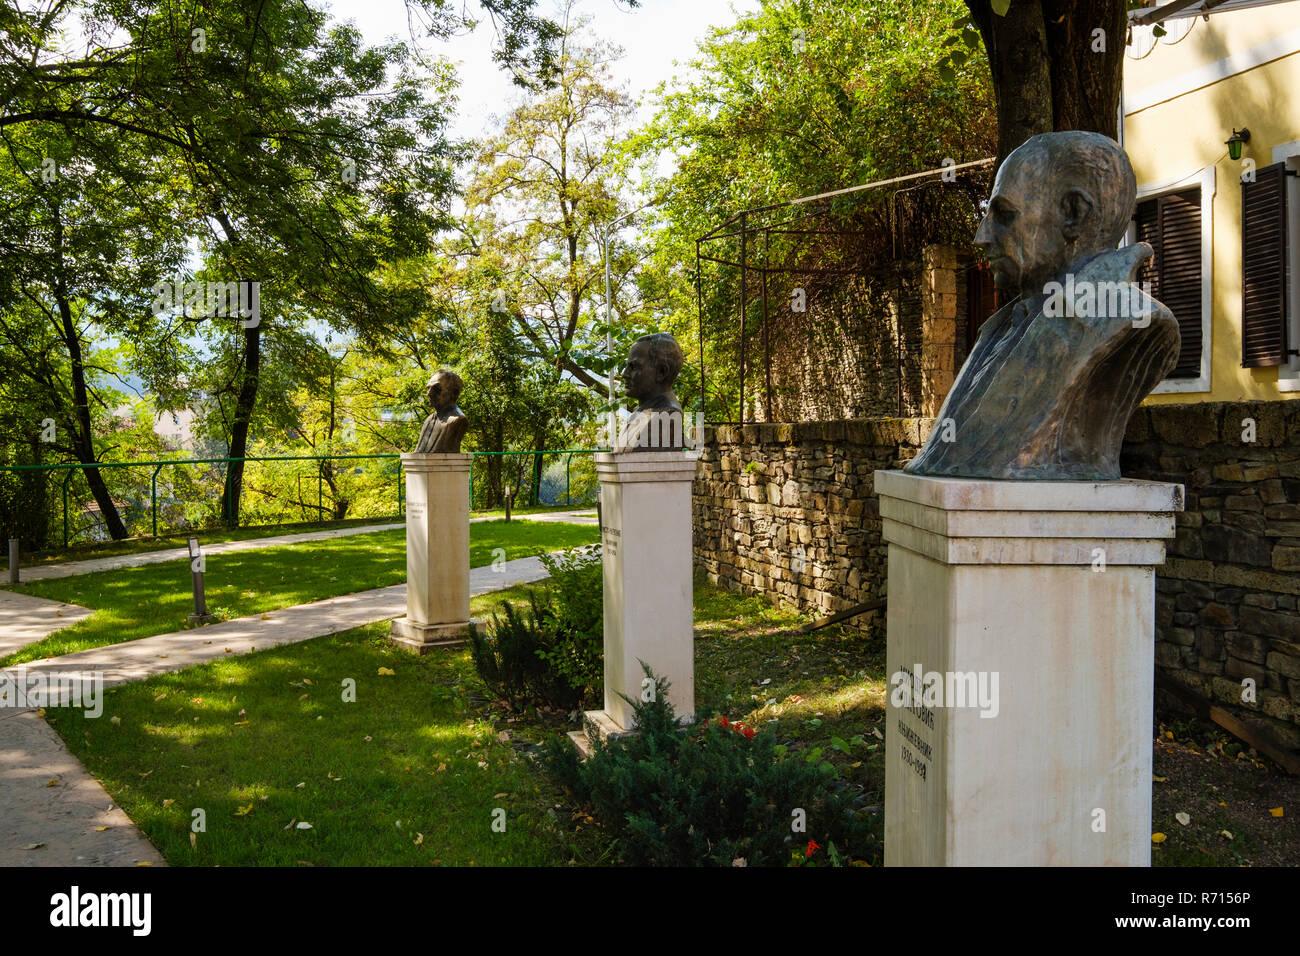 Busts, Park of poets, Bijelo Polje, Montenegro - Stock Image